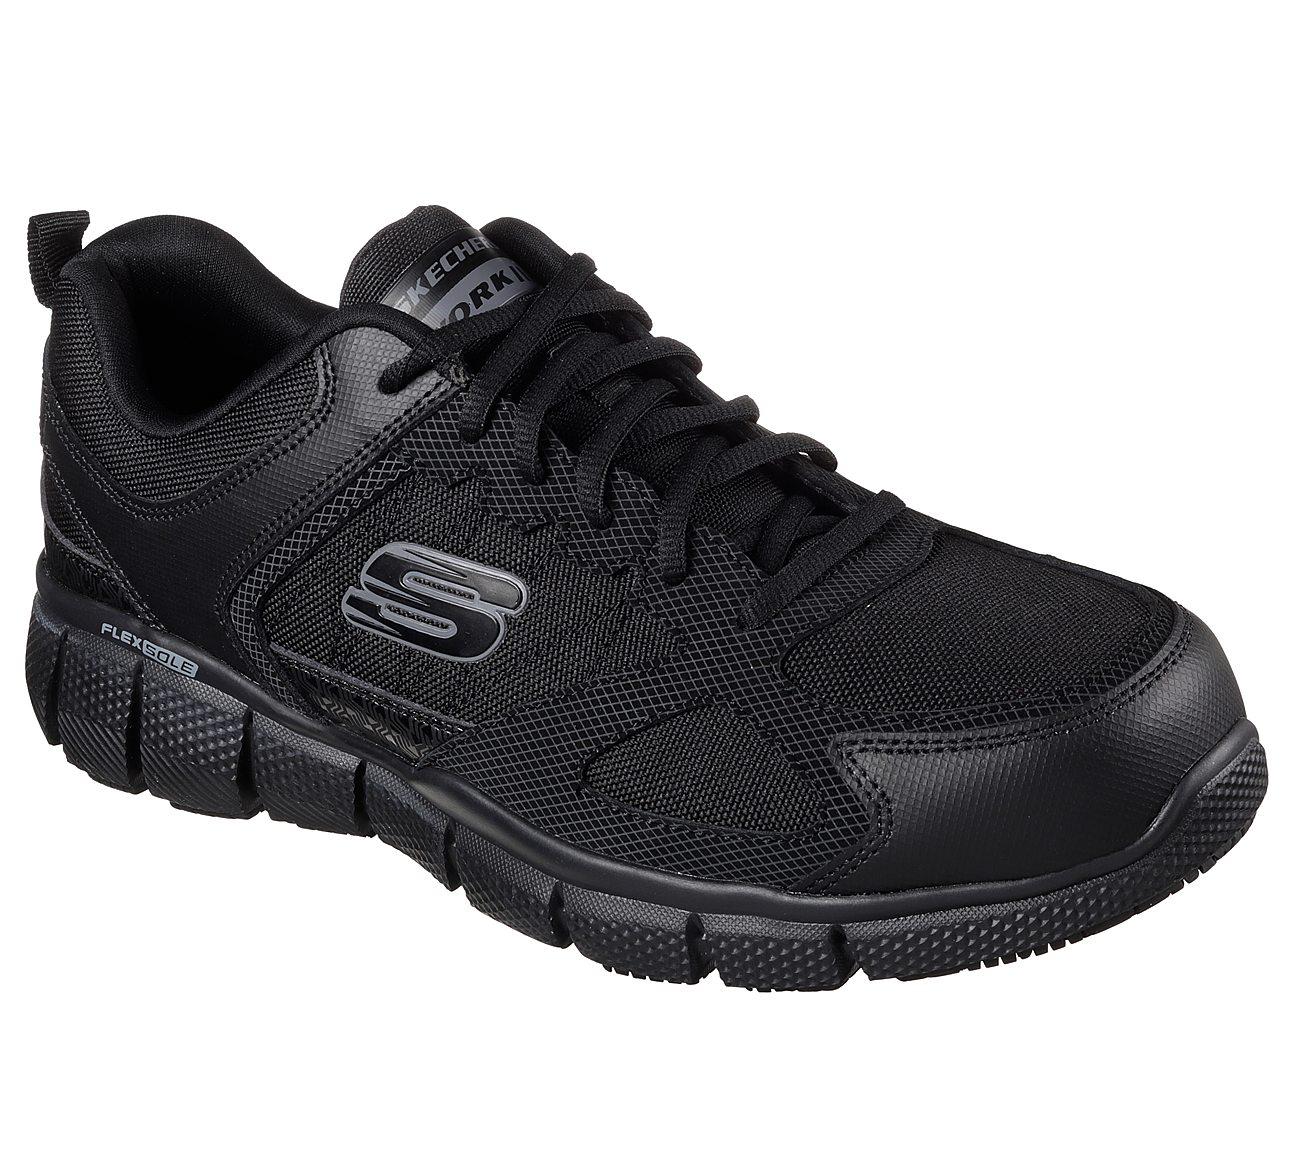 Men's Skechers Relaxed Fit Cessnock Slip Resistant Work Shoes